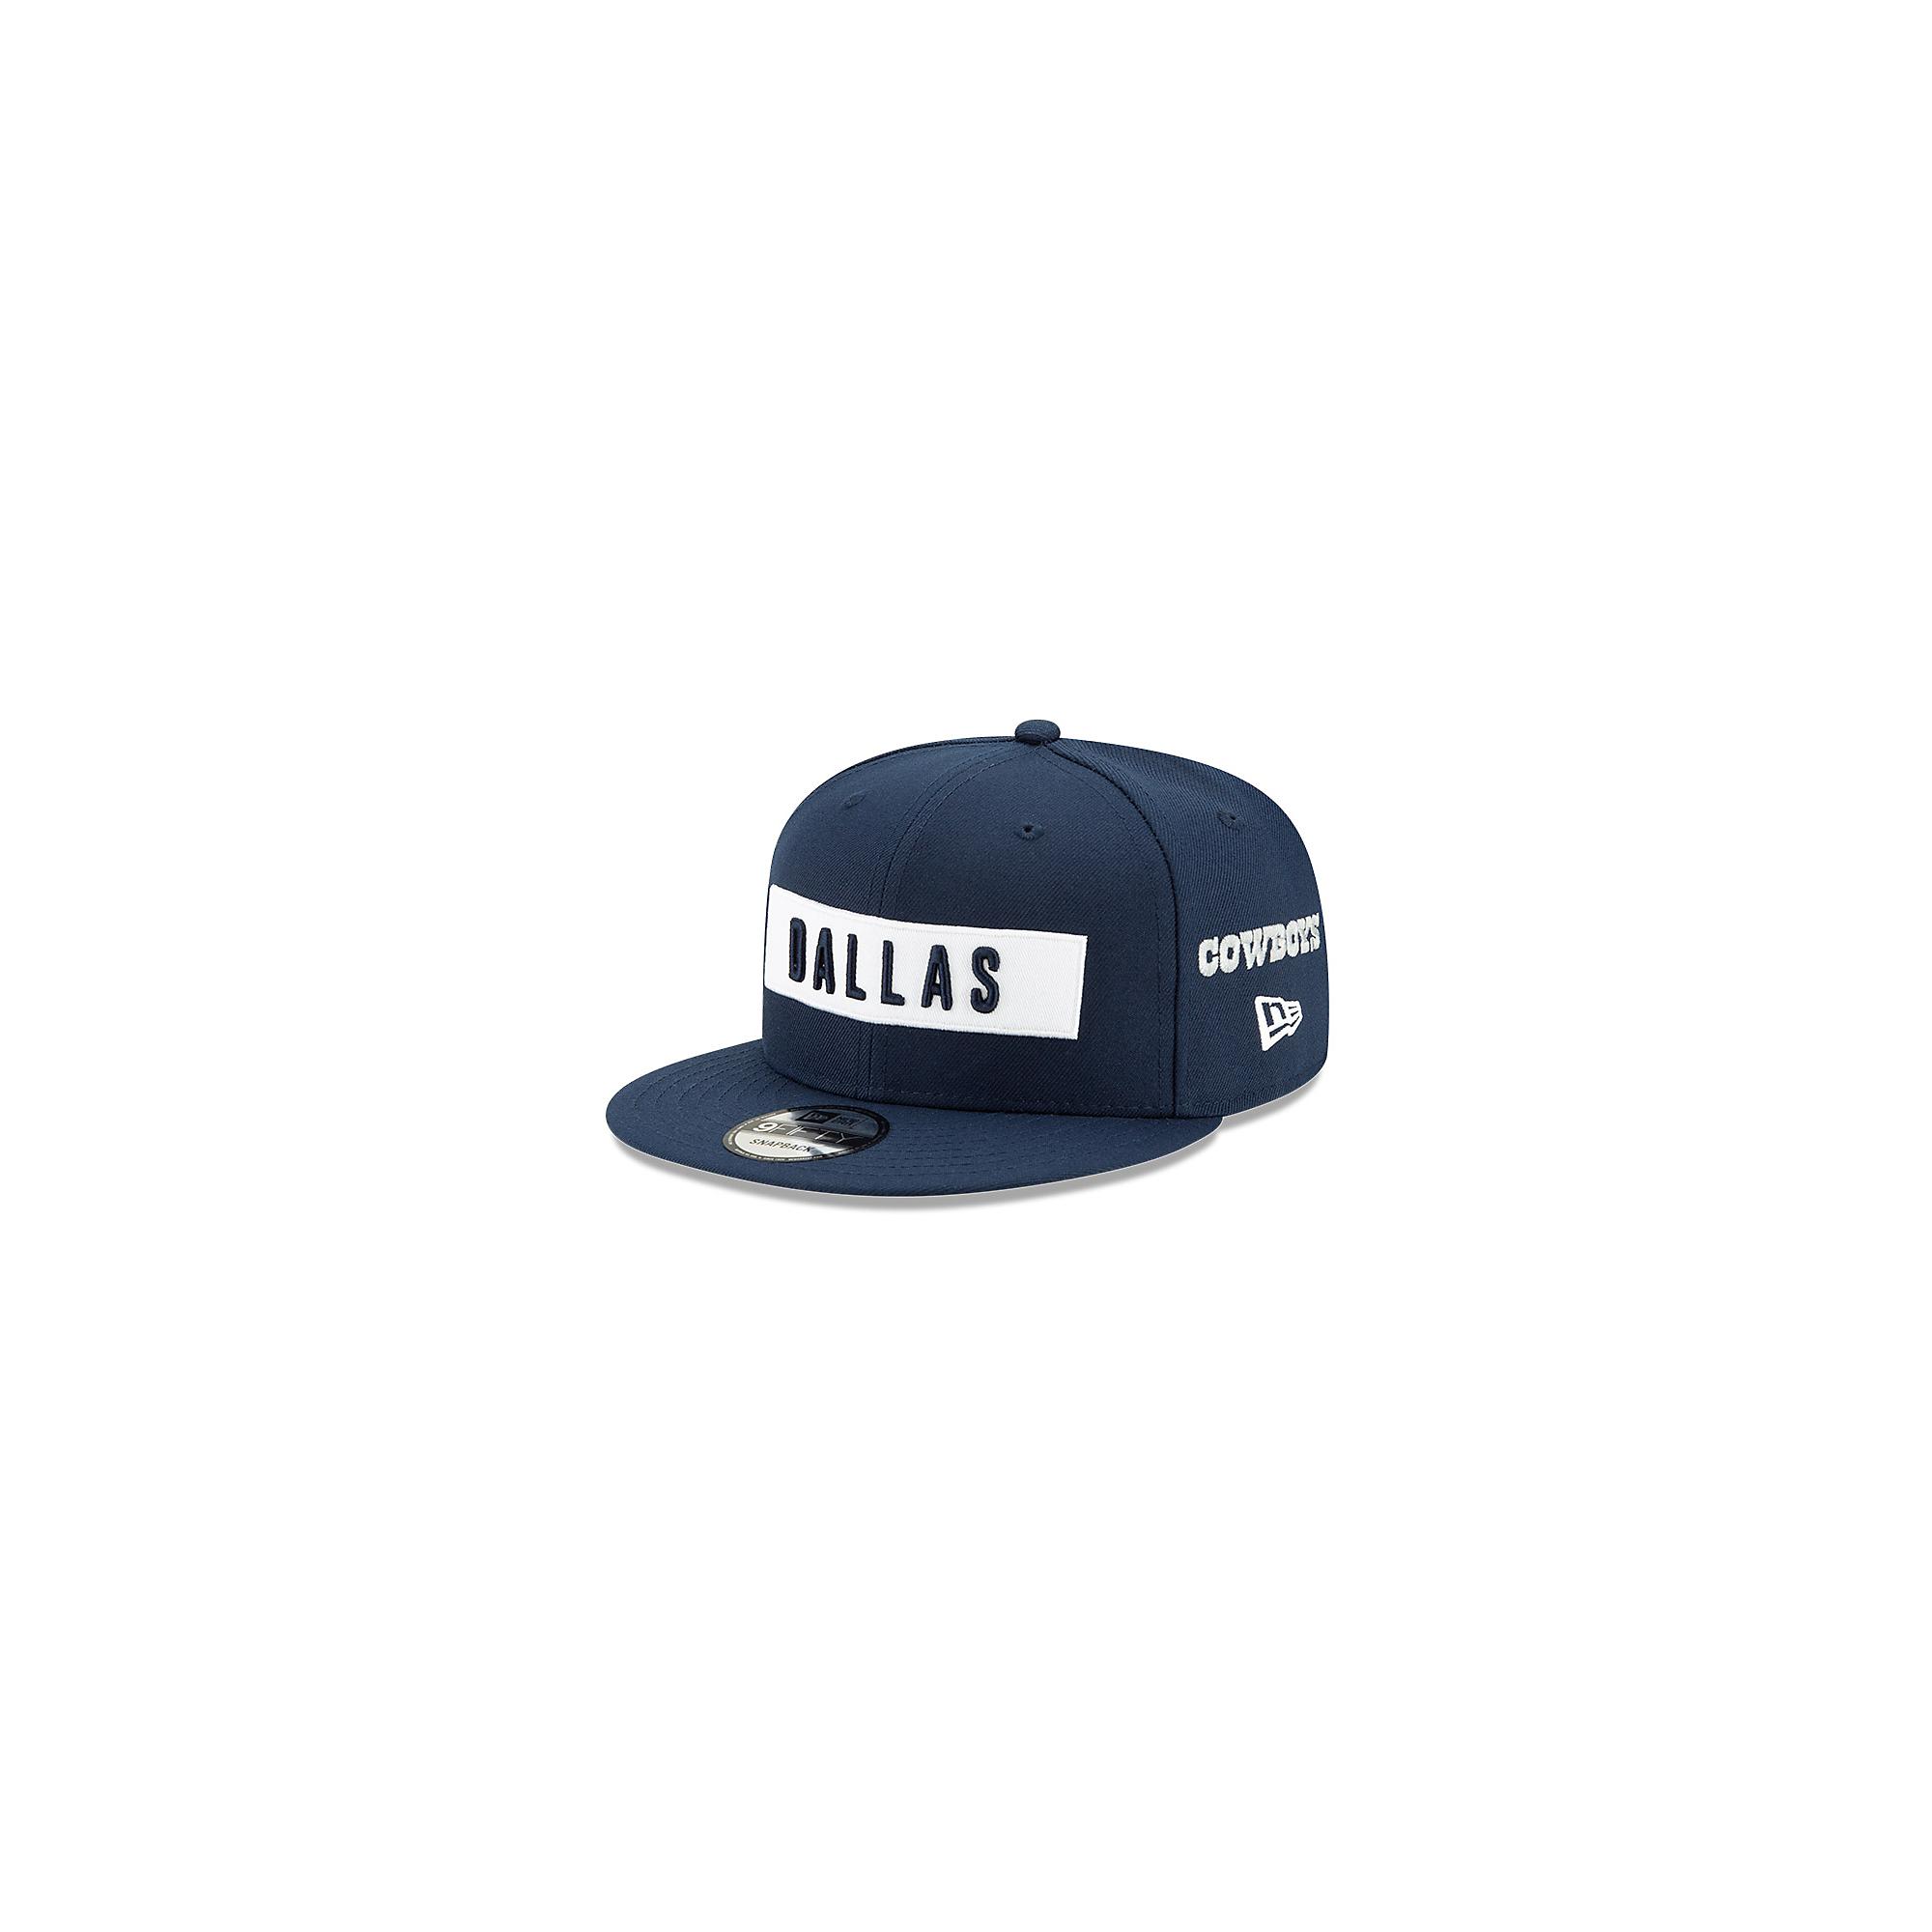 Dallas Cowboys New Era Youth Multi 9Fifty Hat